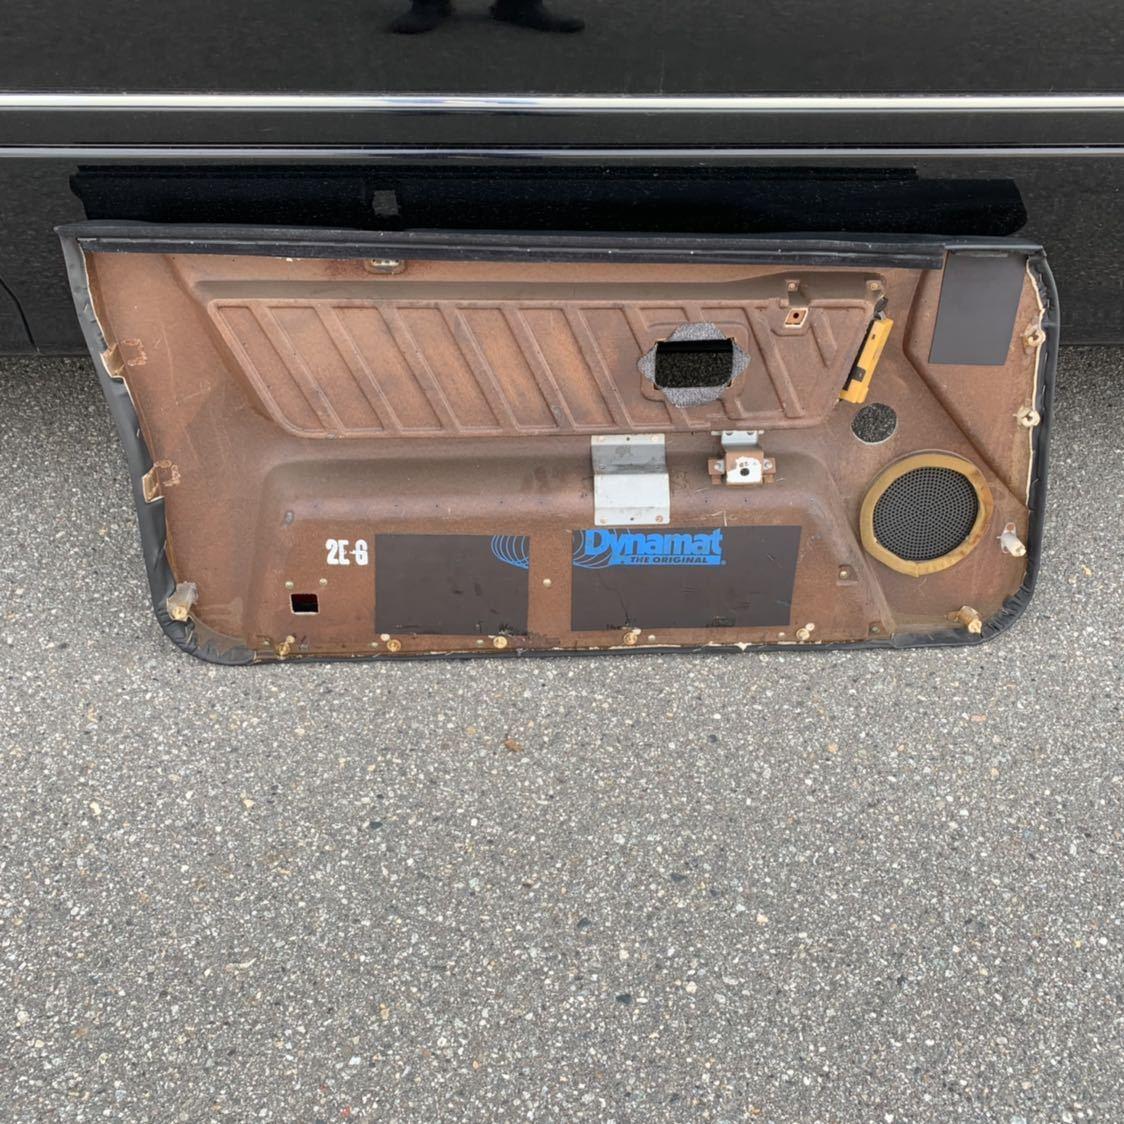 HR31 R31 スカイライン 2ドア GTS-R 右側 ドア内張り 穴あけ有り 限定車 ニスモ仕様_画像6